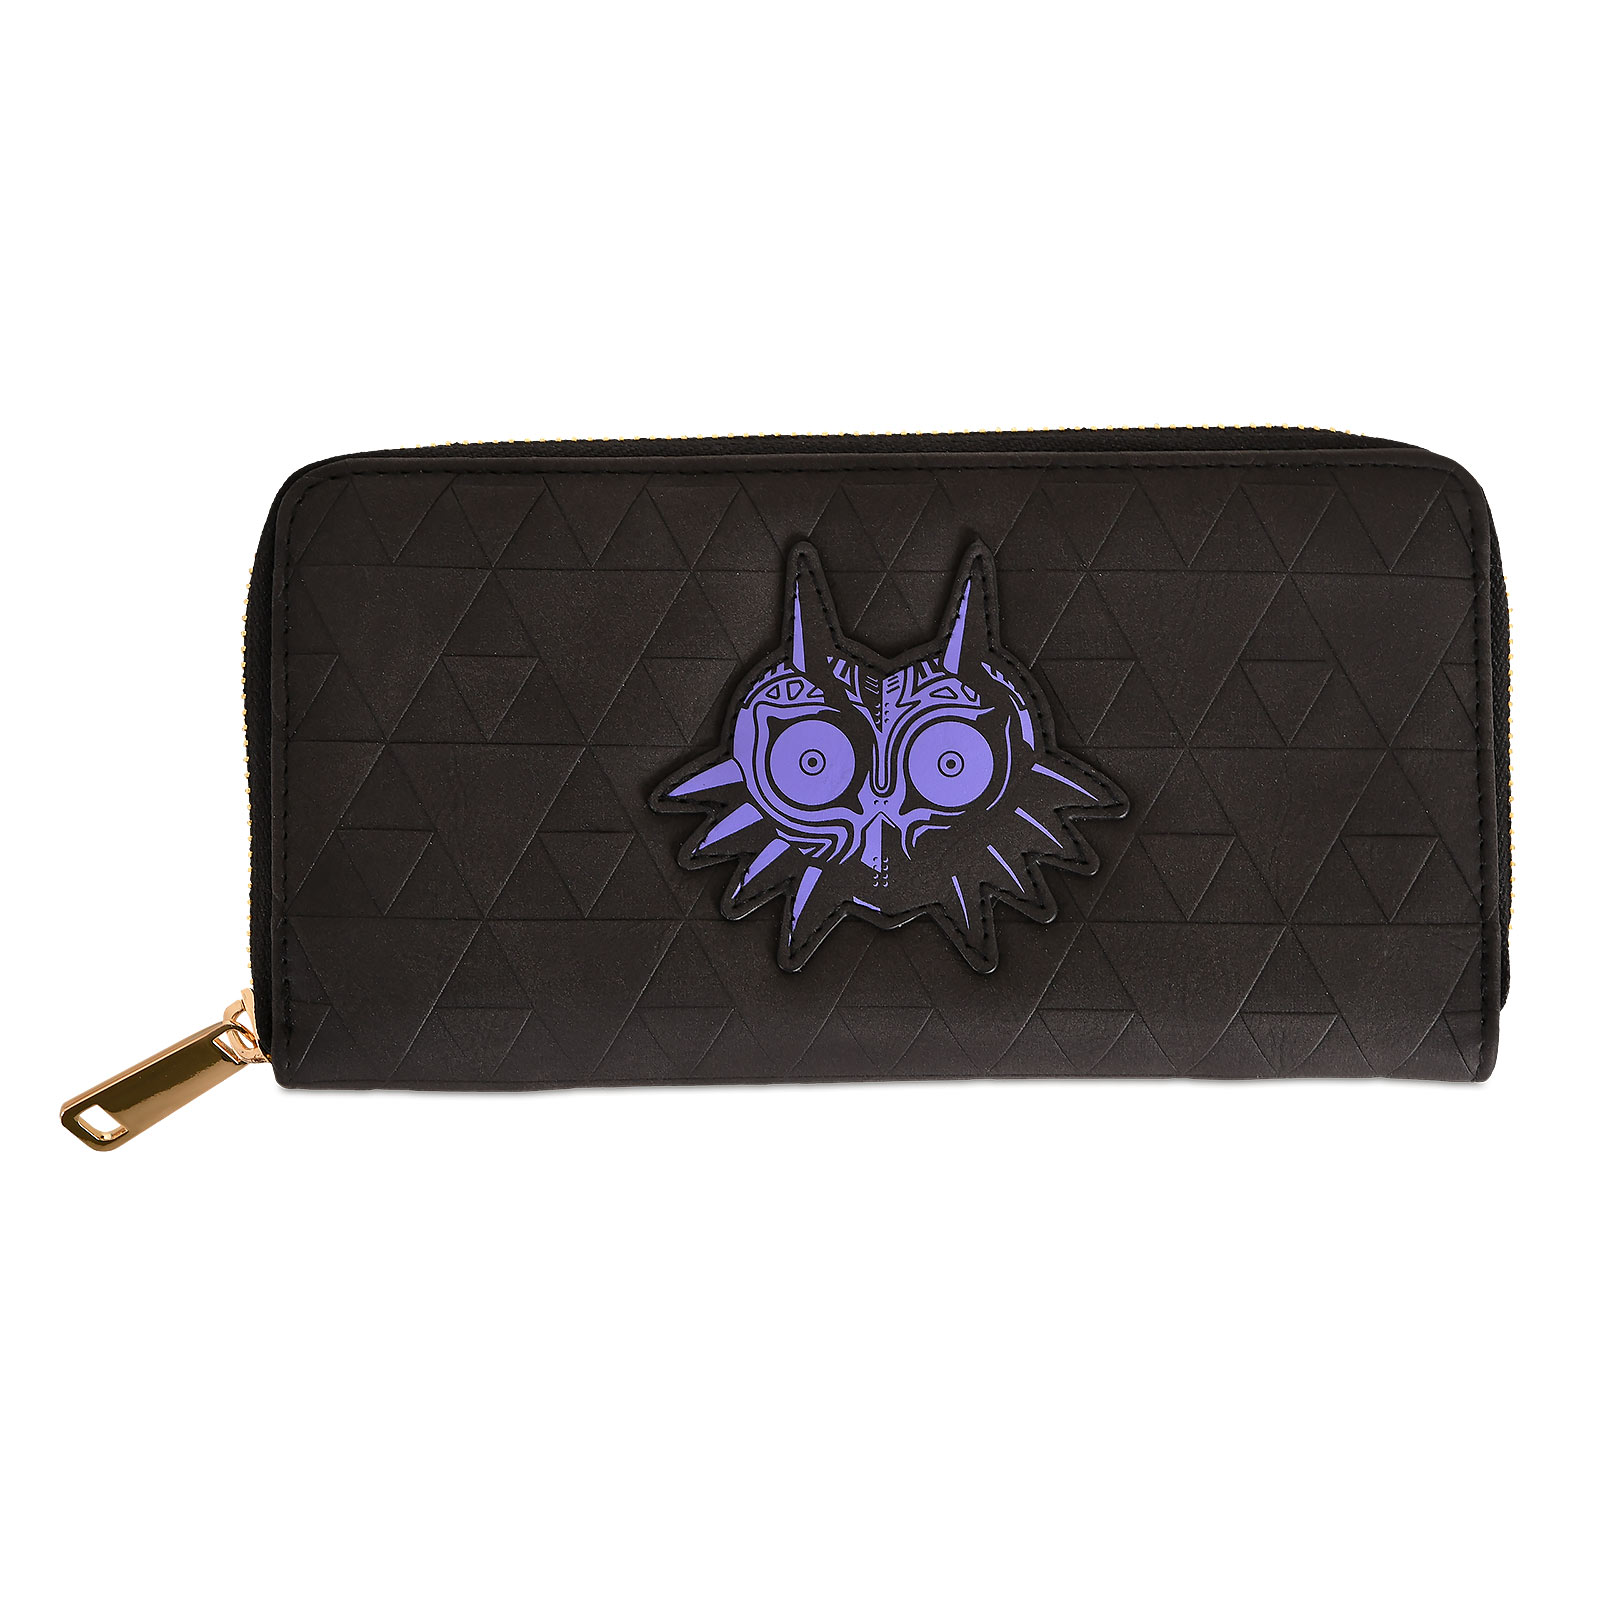 Zelda - Majora's Mask Geldbörse schwarz